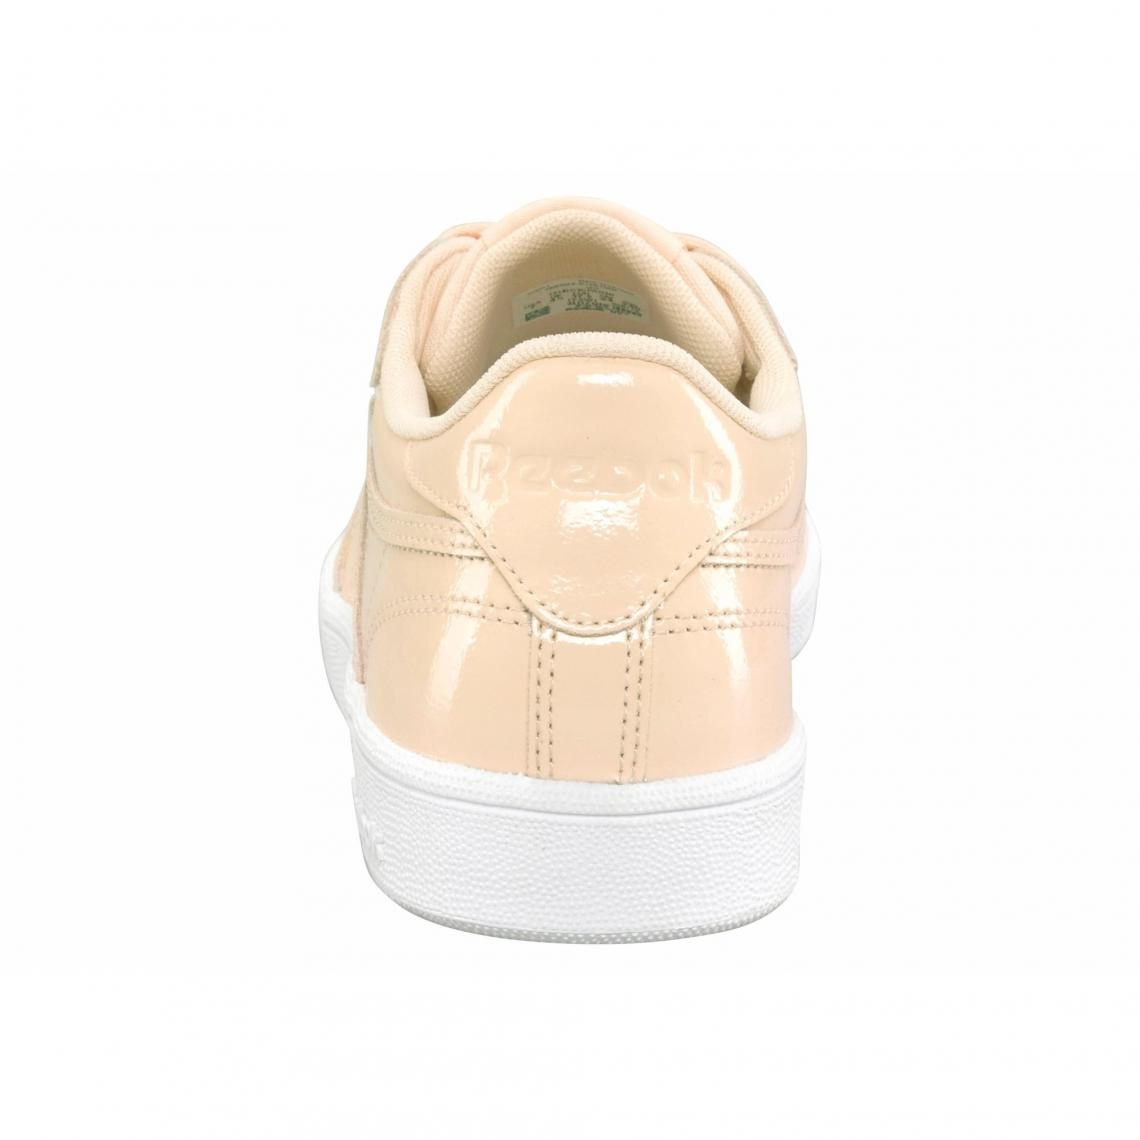 3b63fa51c58 Sneakers en cuir verni brillant femme Classique Club C85 Patent Reebok - Rose  Reebok